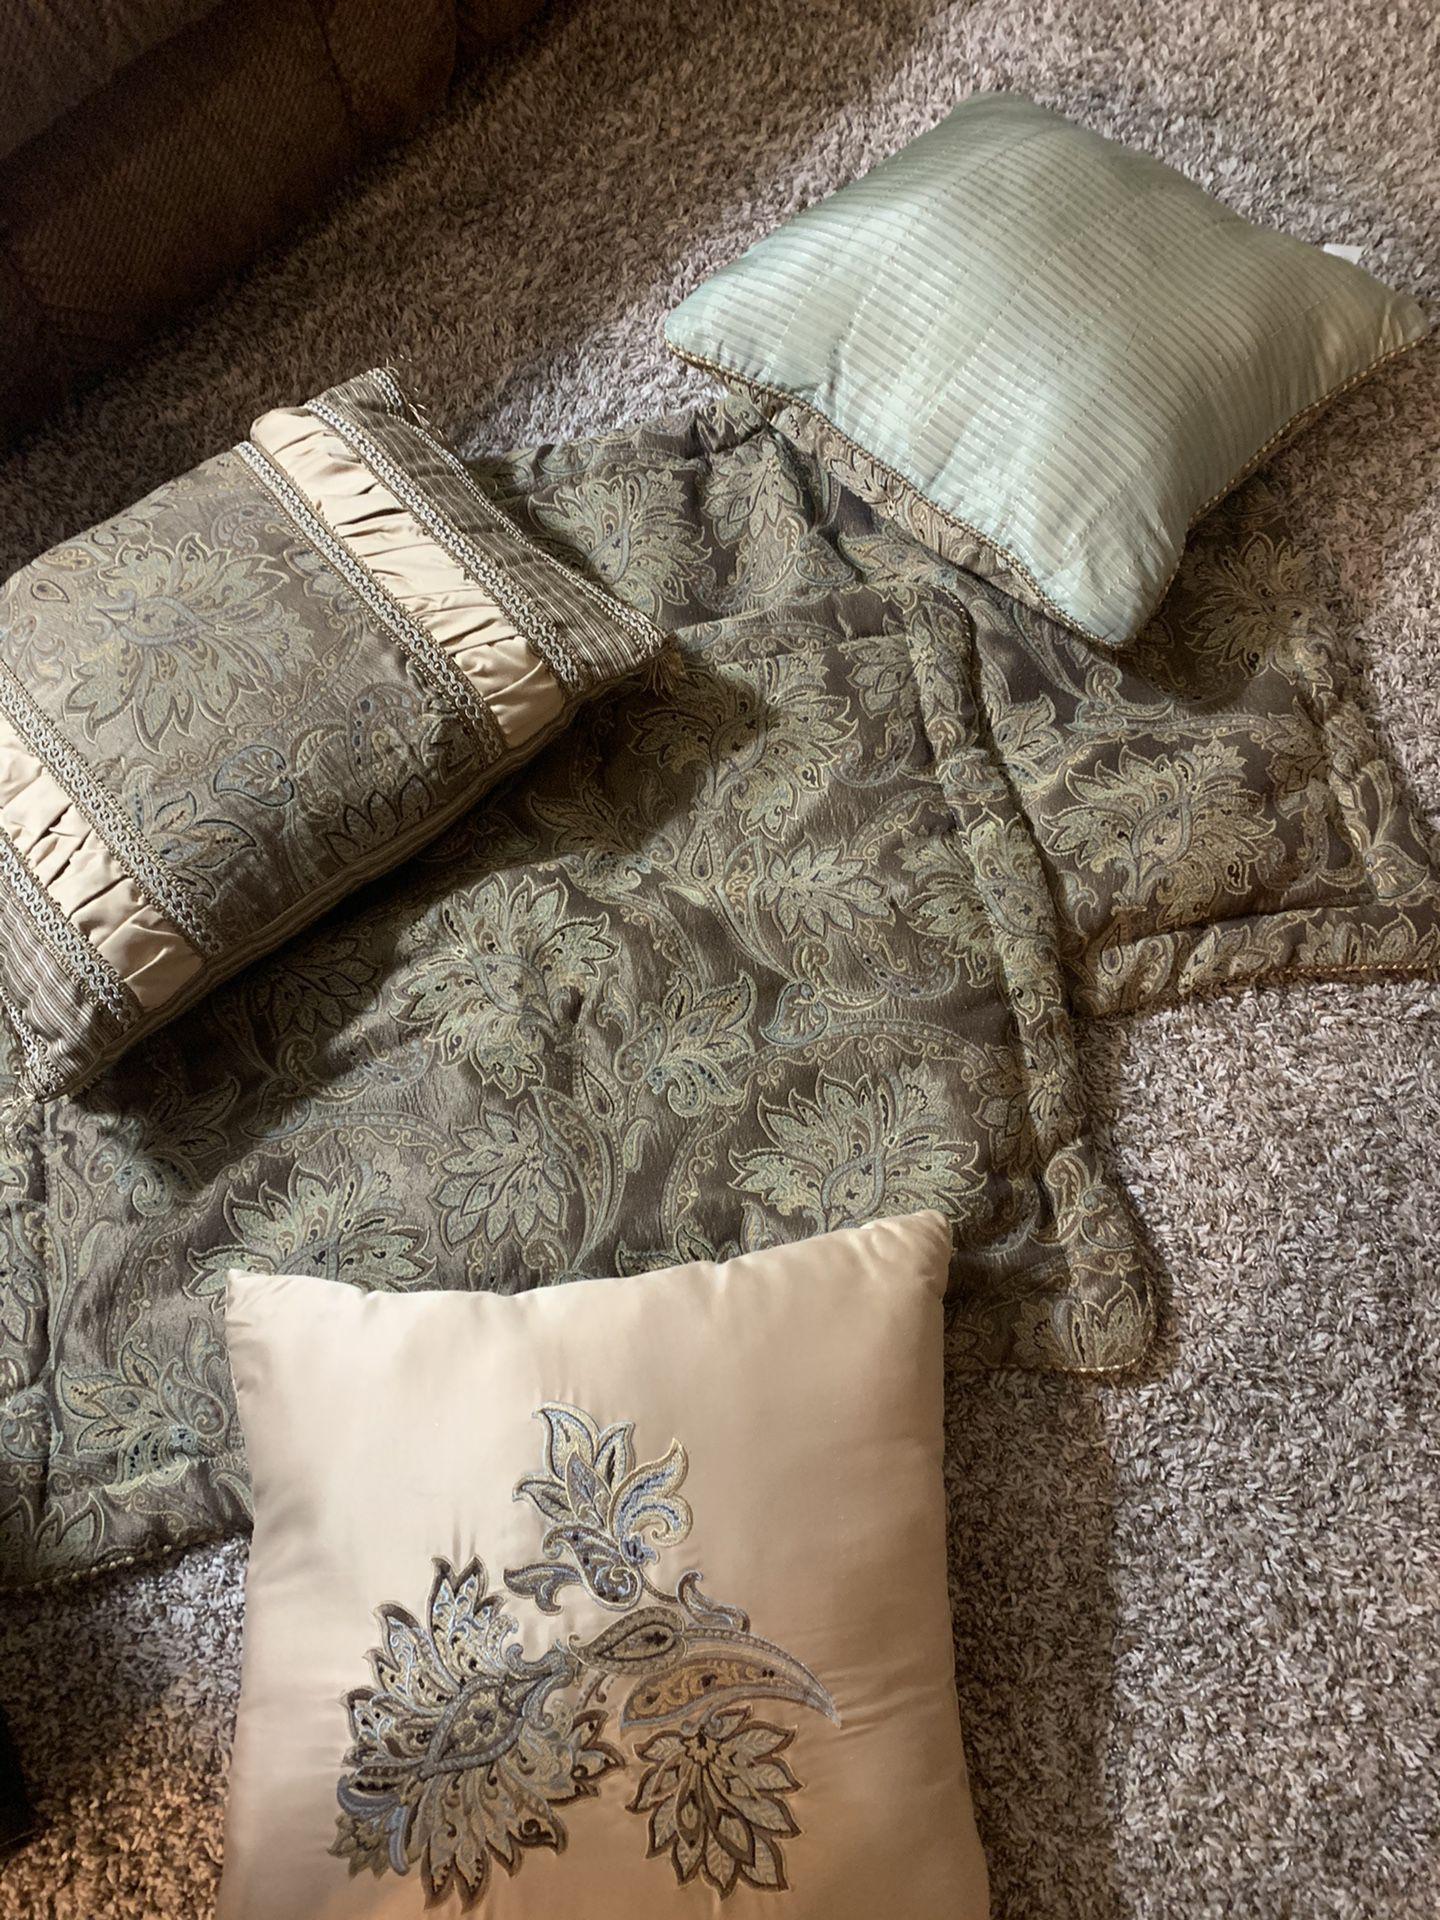 Queen Comforter,Pillow Cases And Throw Pillows